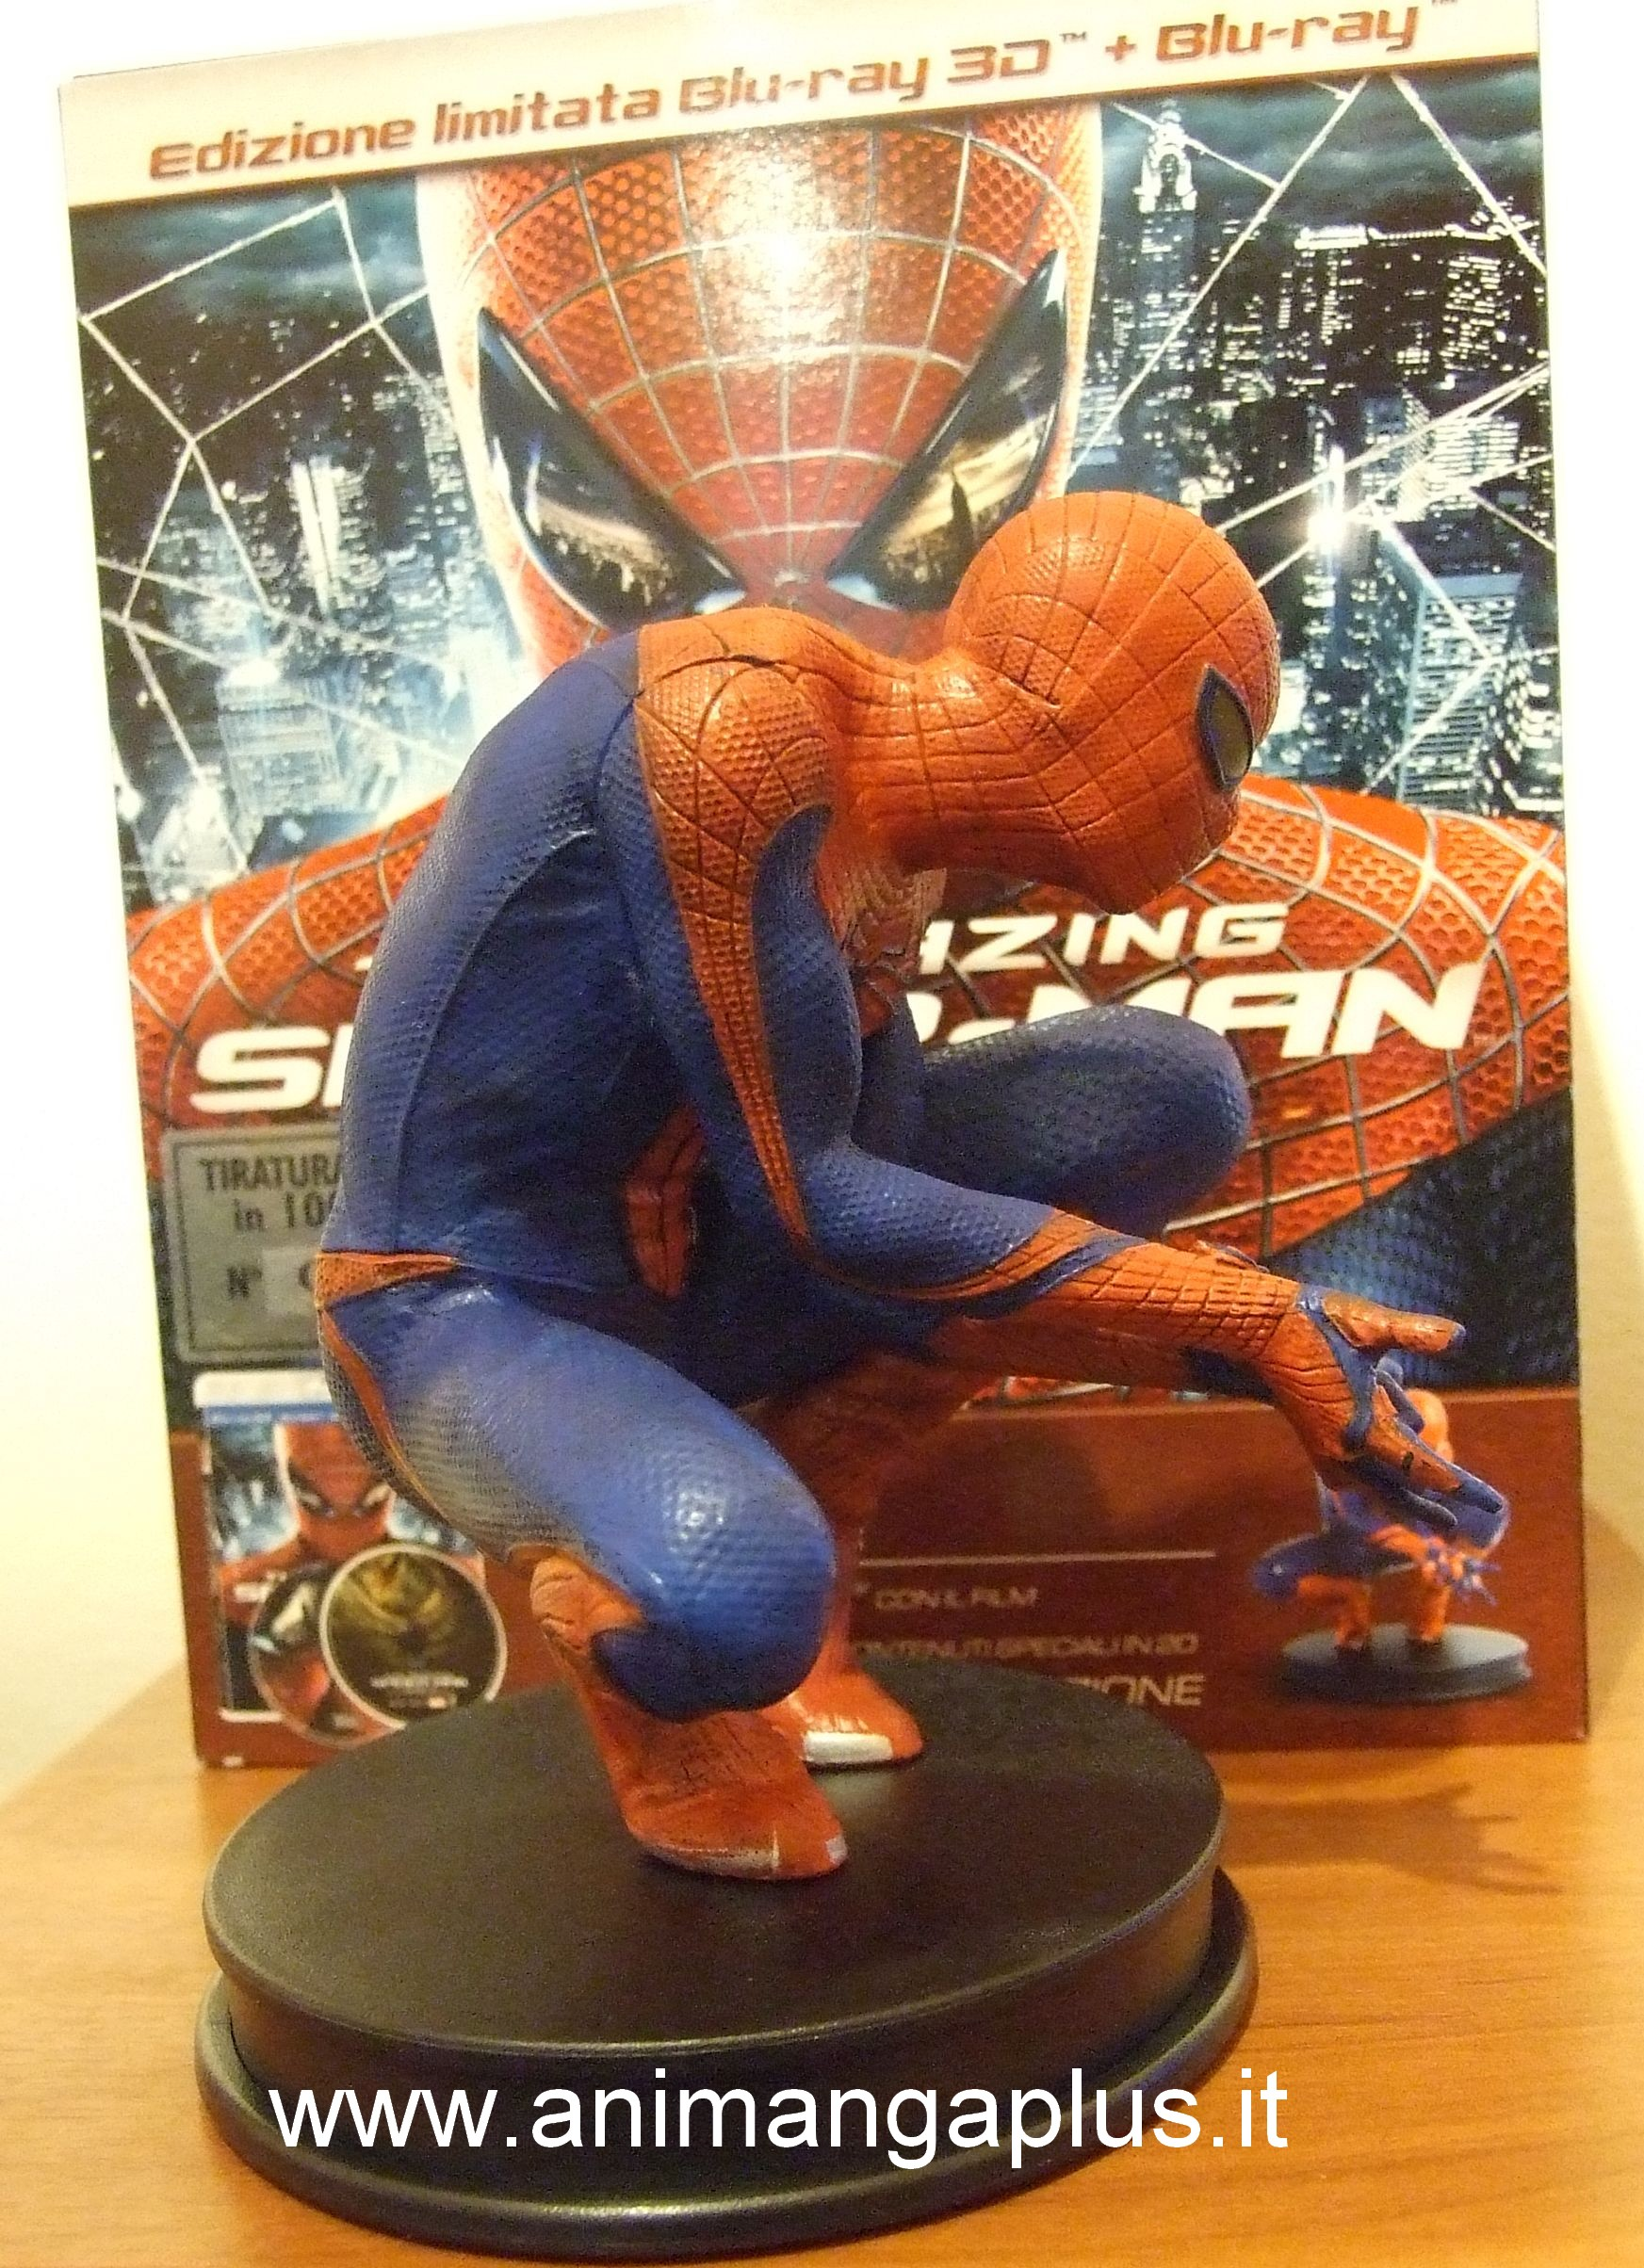 Amazing Spider-Man LImited